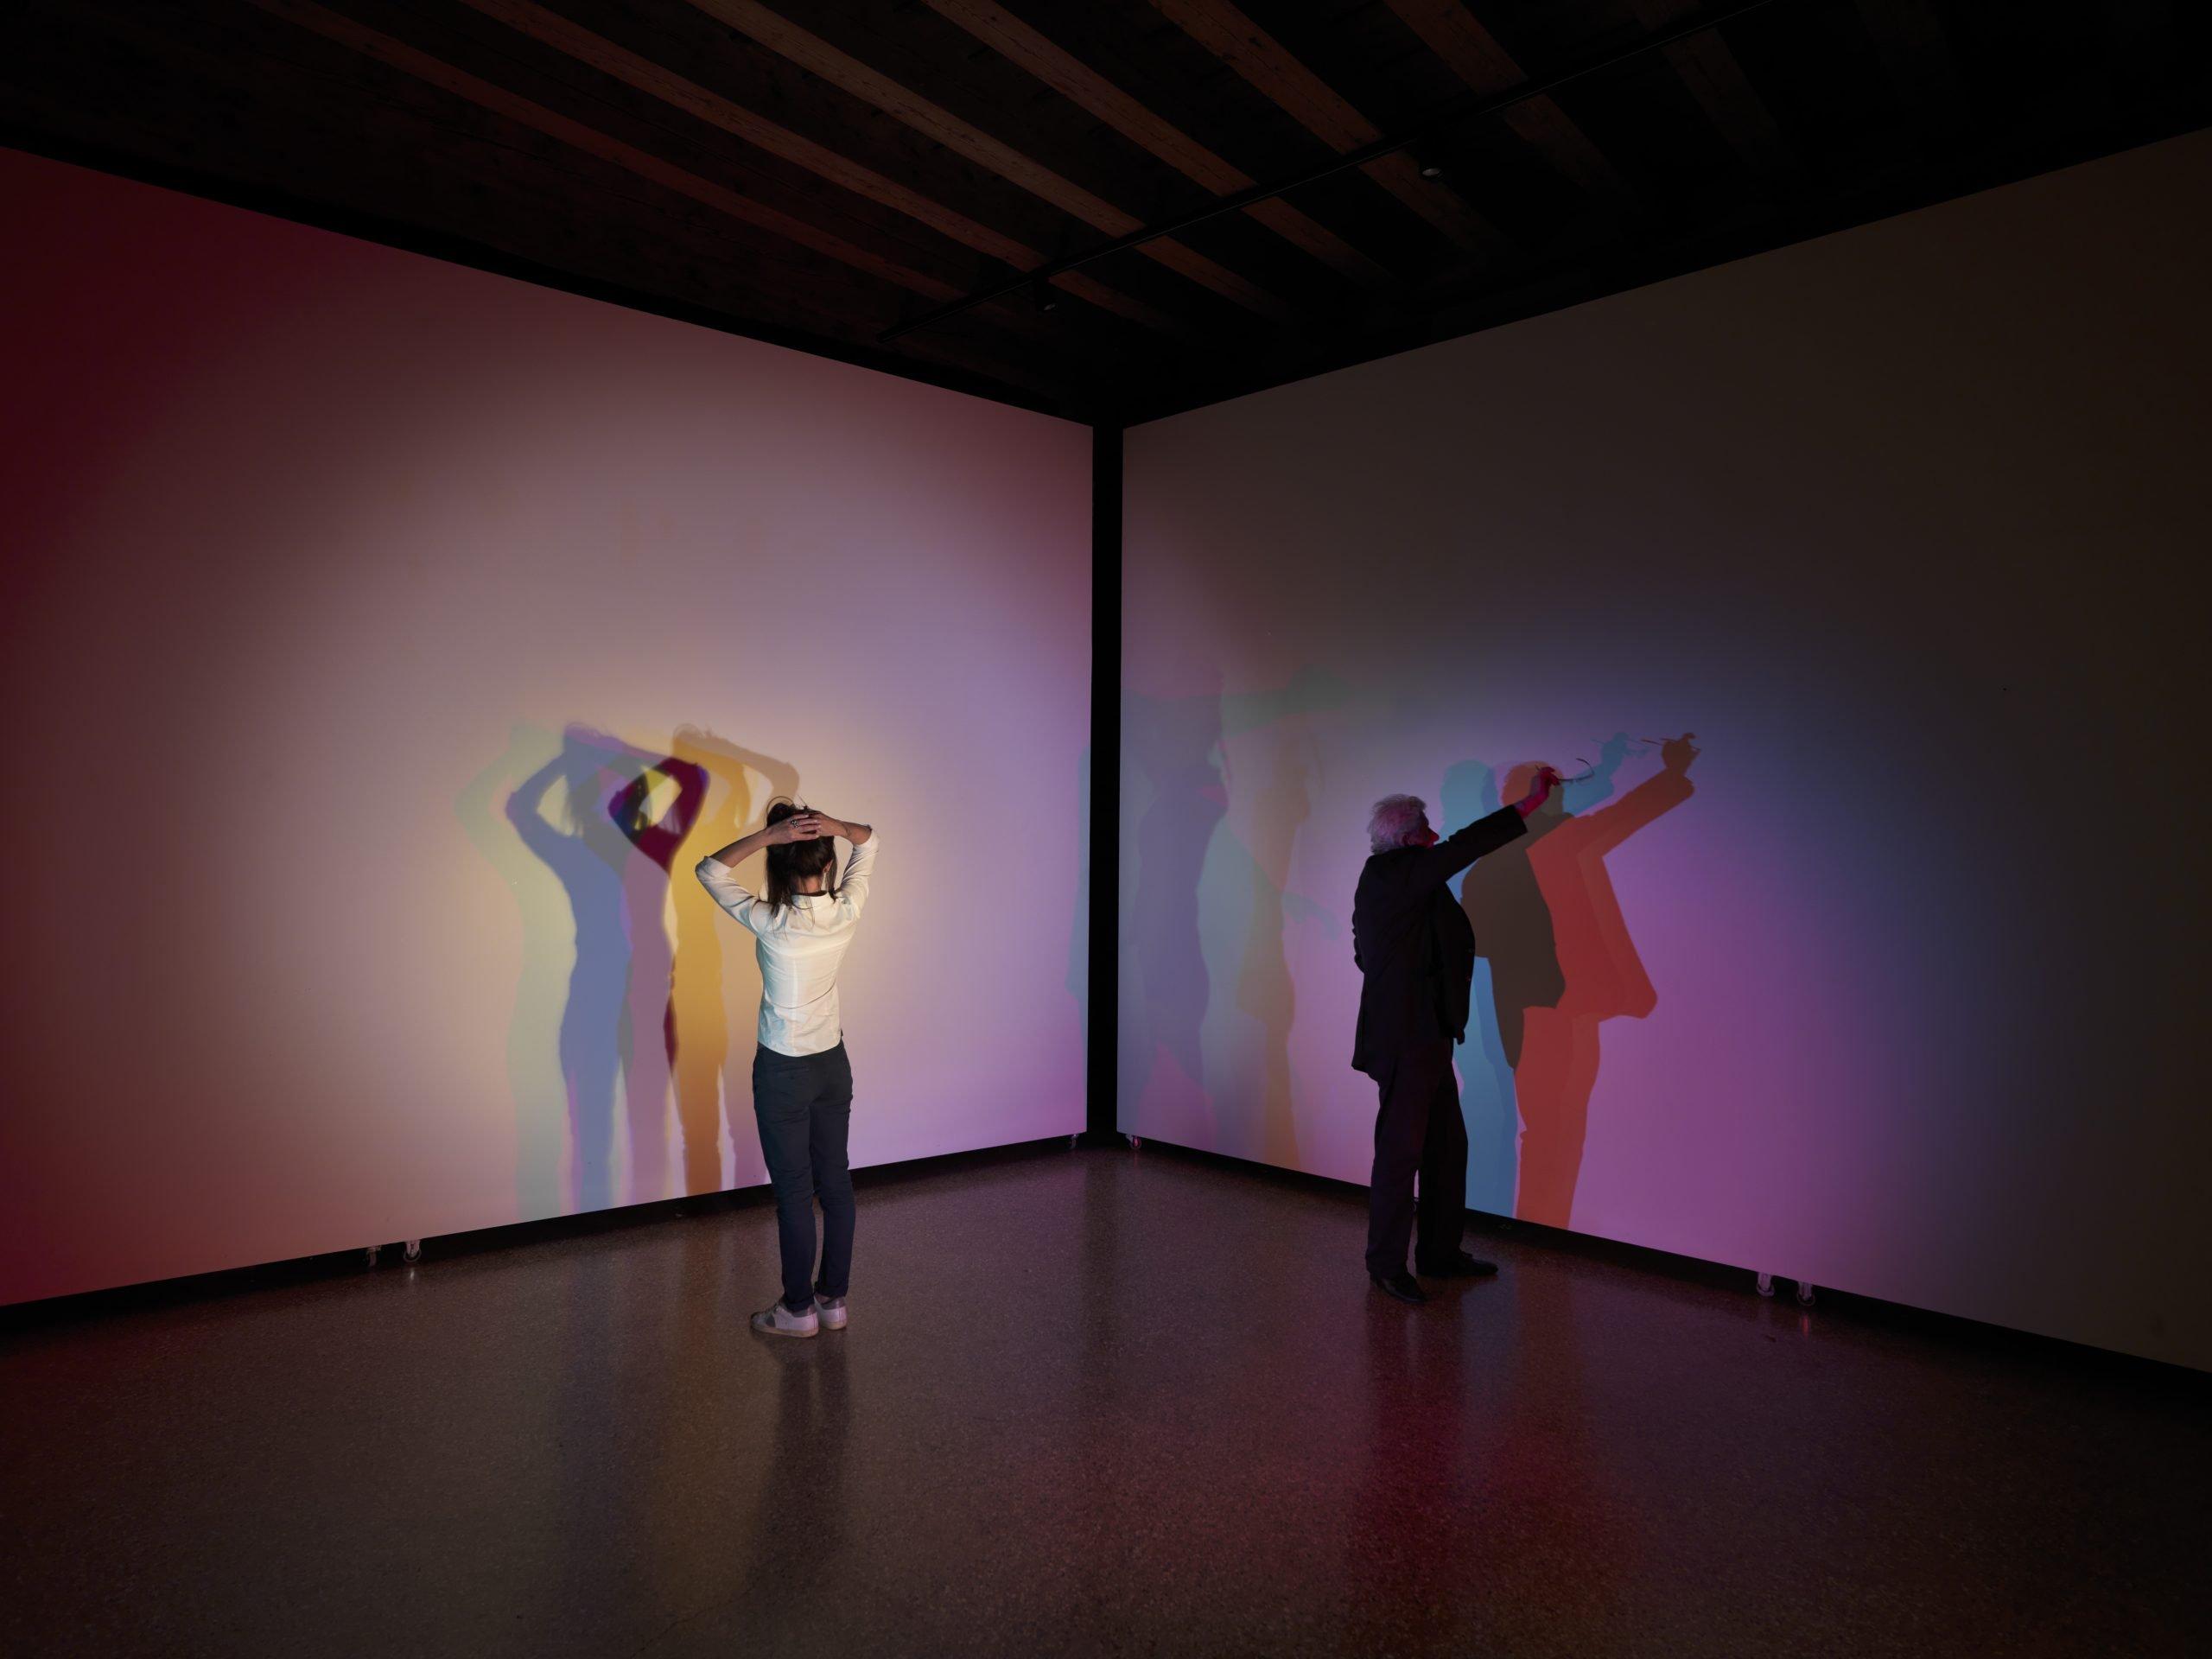 Alberto Biasi, Tu Sei, 1973, mixed media:LED light projectors, 20,47 x 19,29 x 56,70 inch